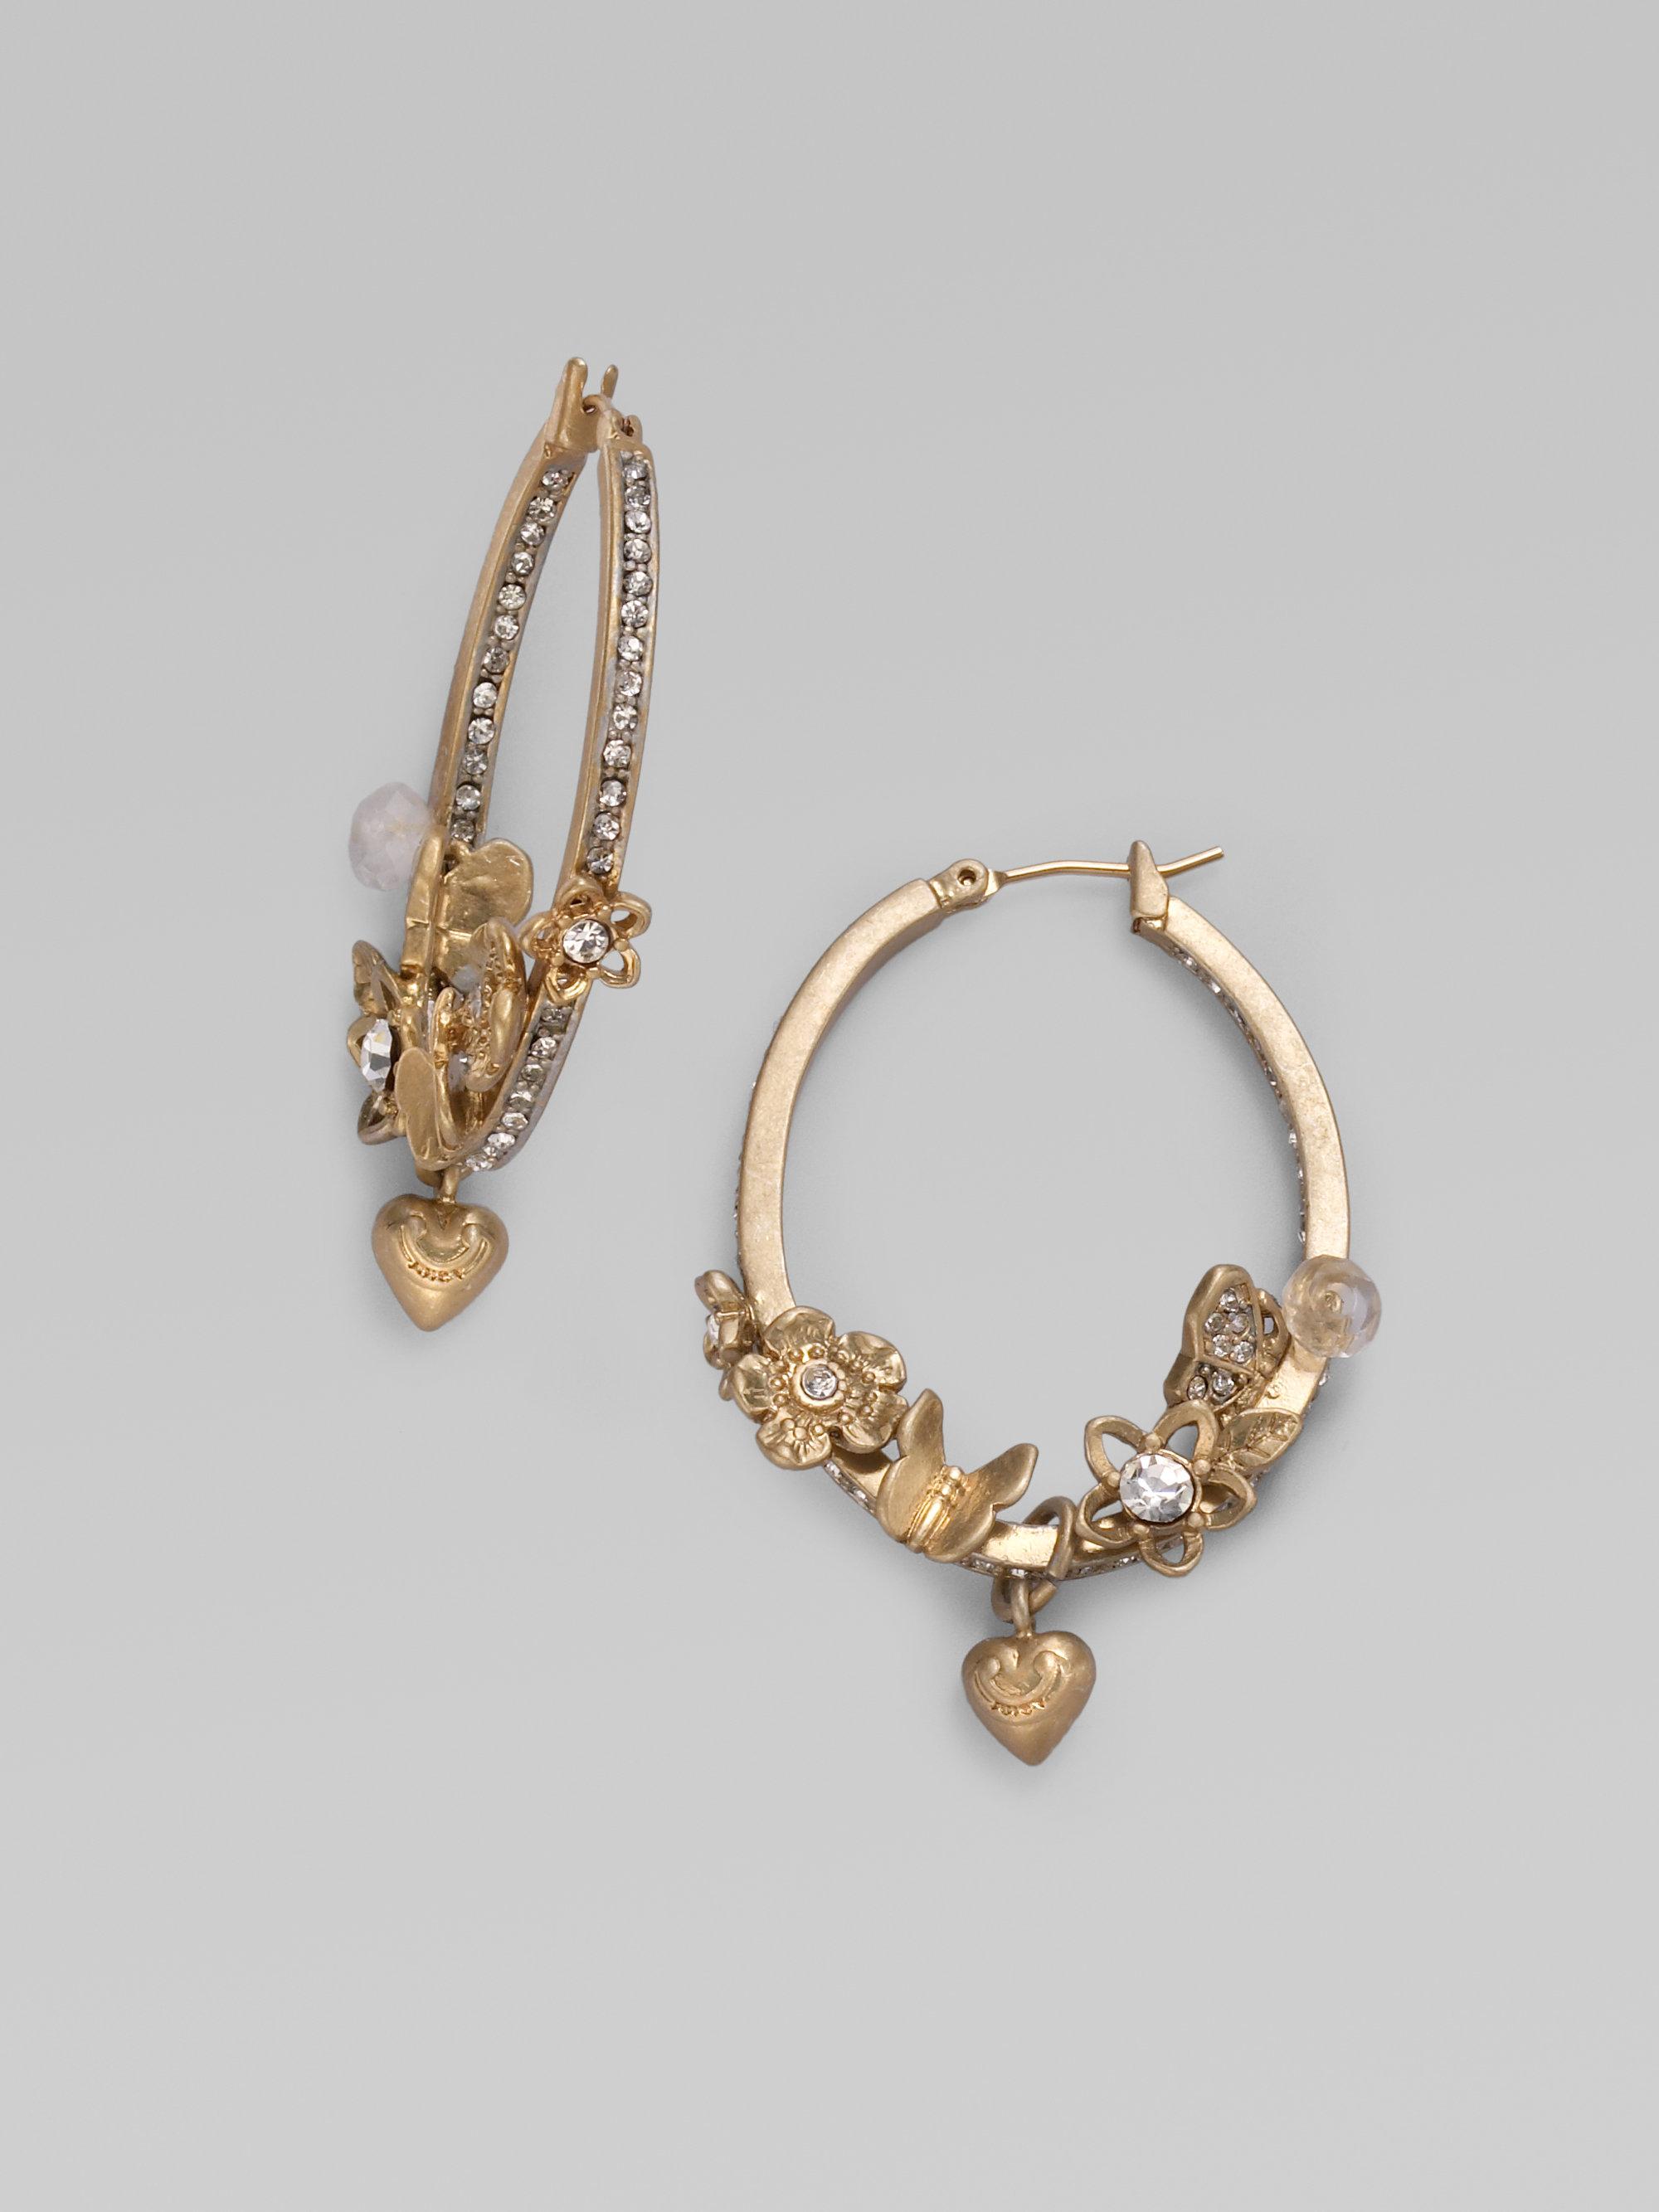 1ea80c6c9c26e Juicy Couture Metallic Oval Flower Hoop Earrings